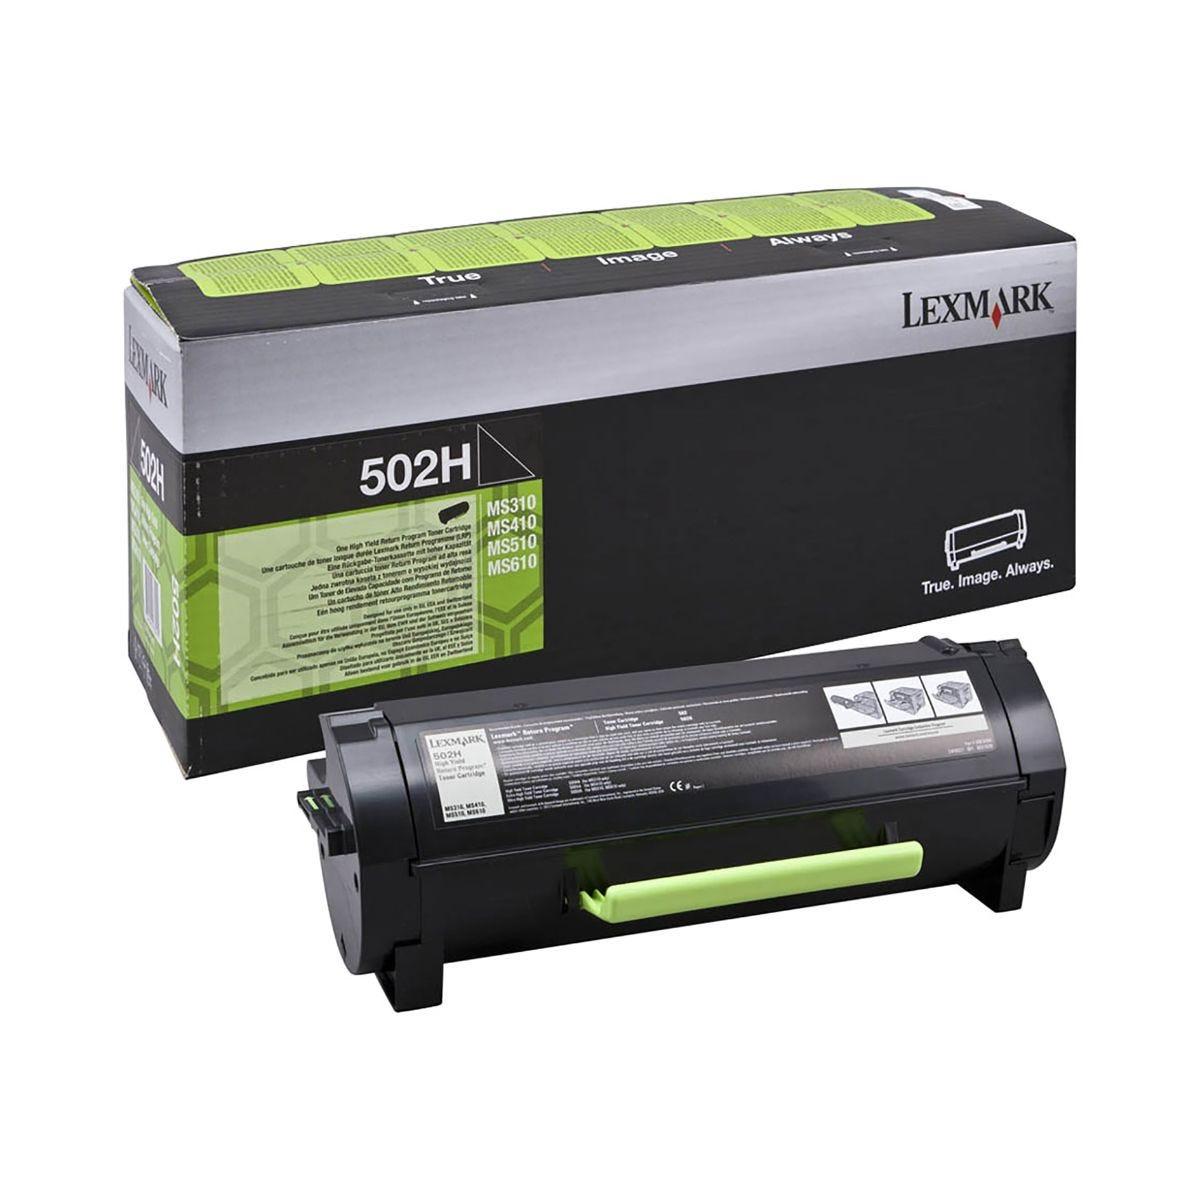 Image of Lexmark 502H Ink Toner Cartridge Black, Black